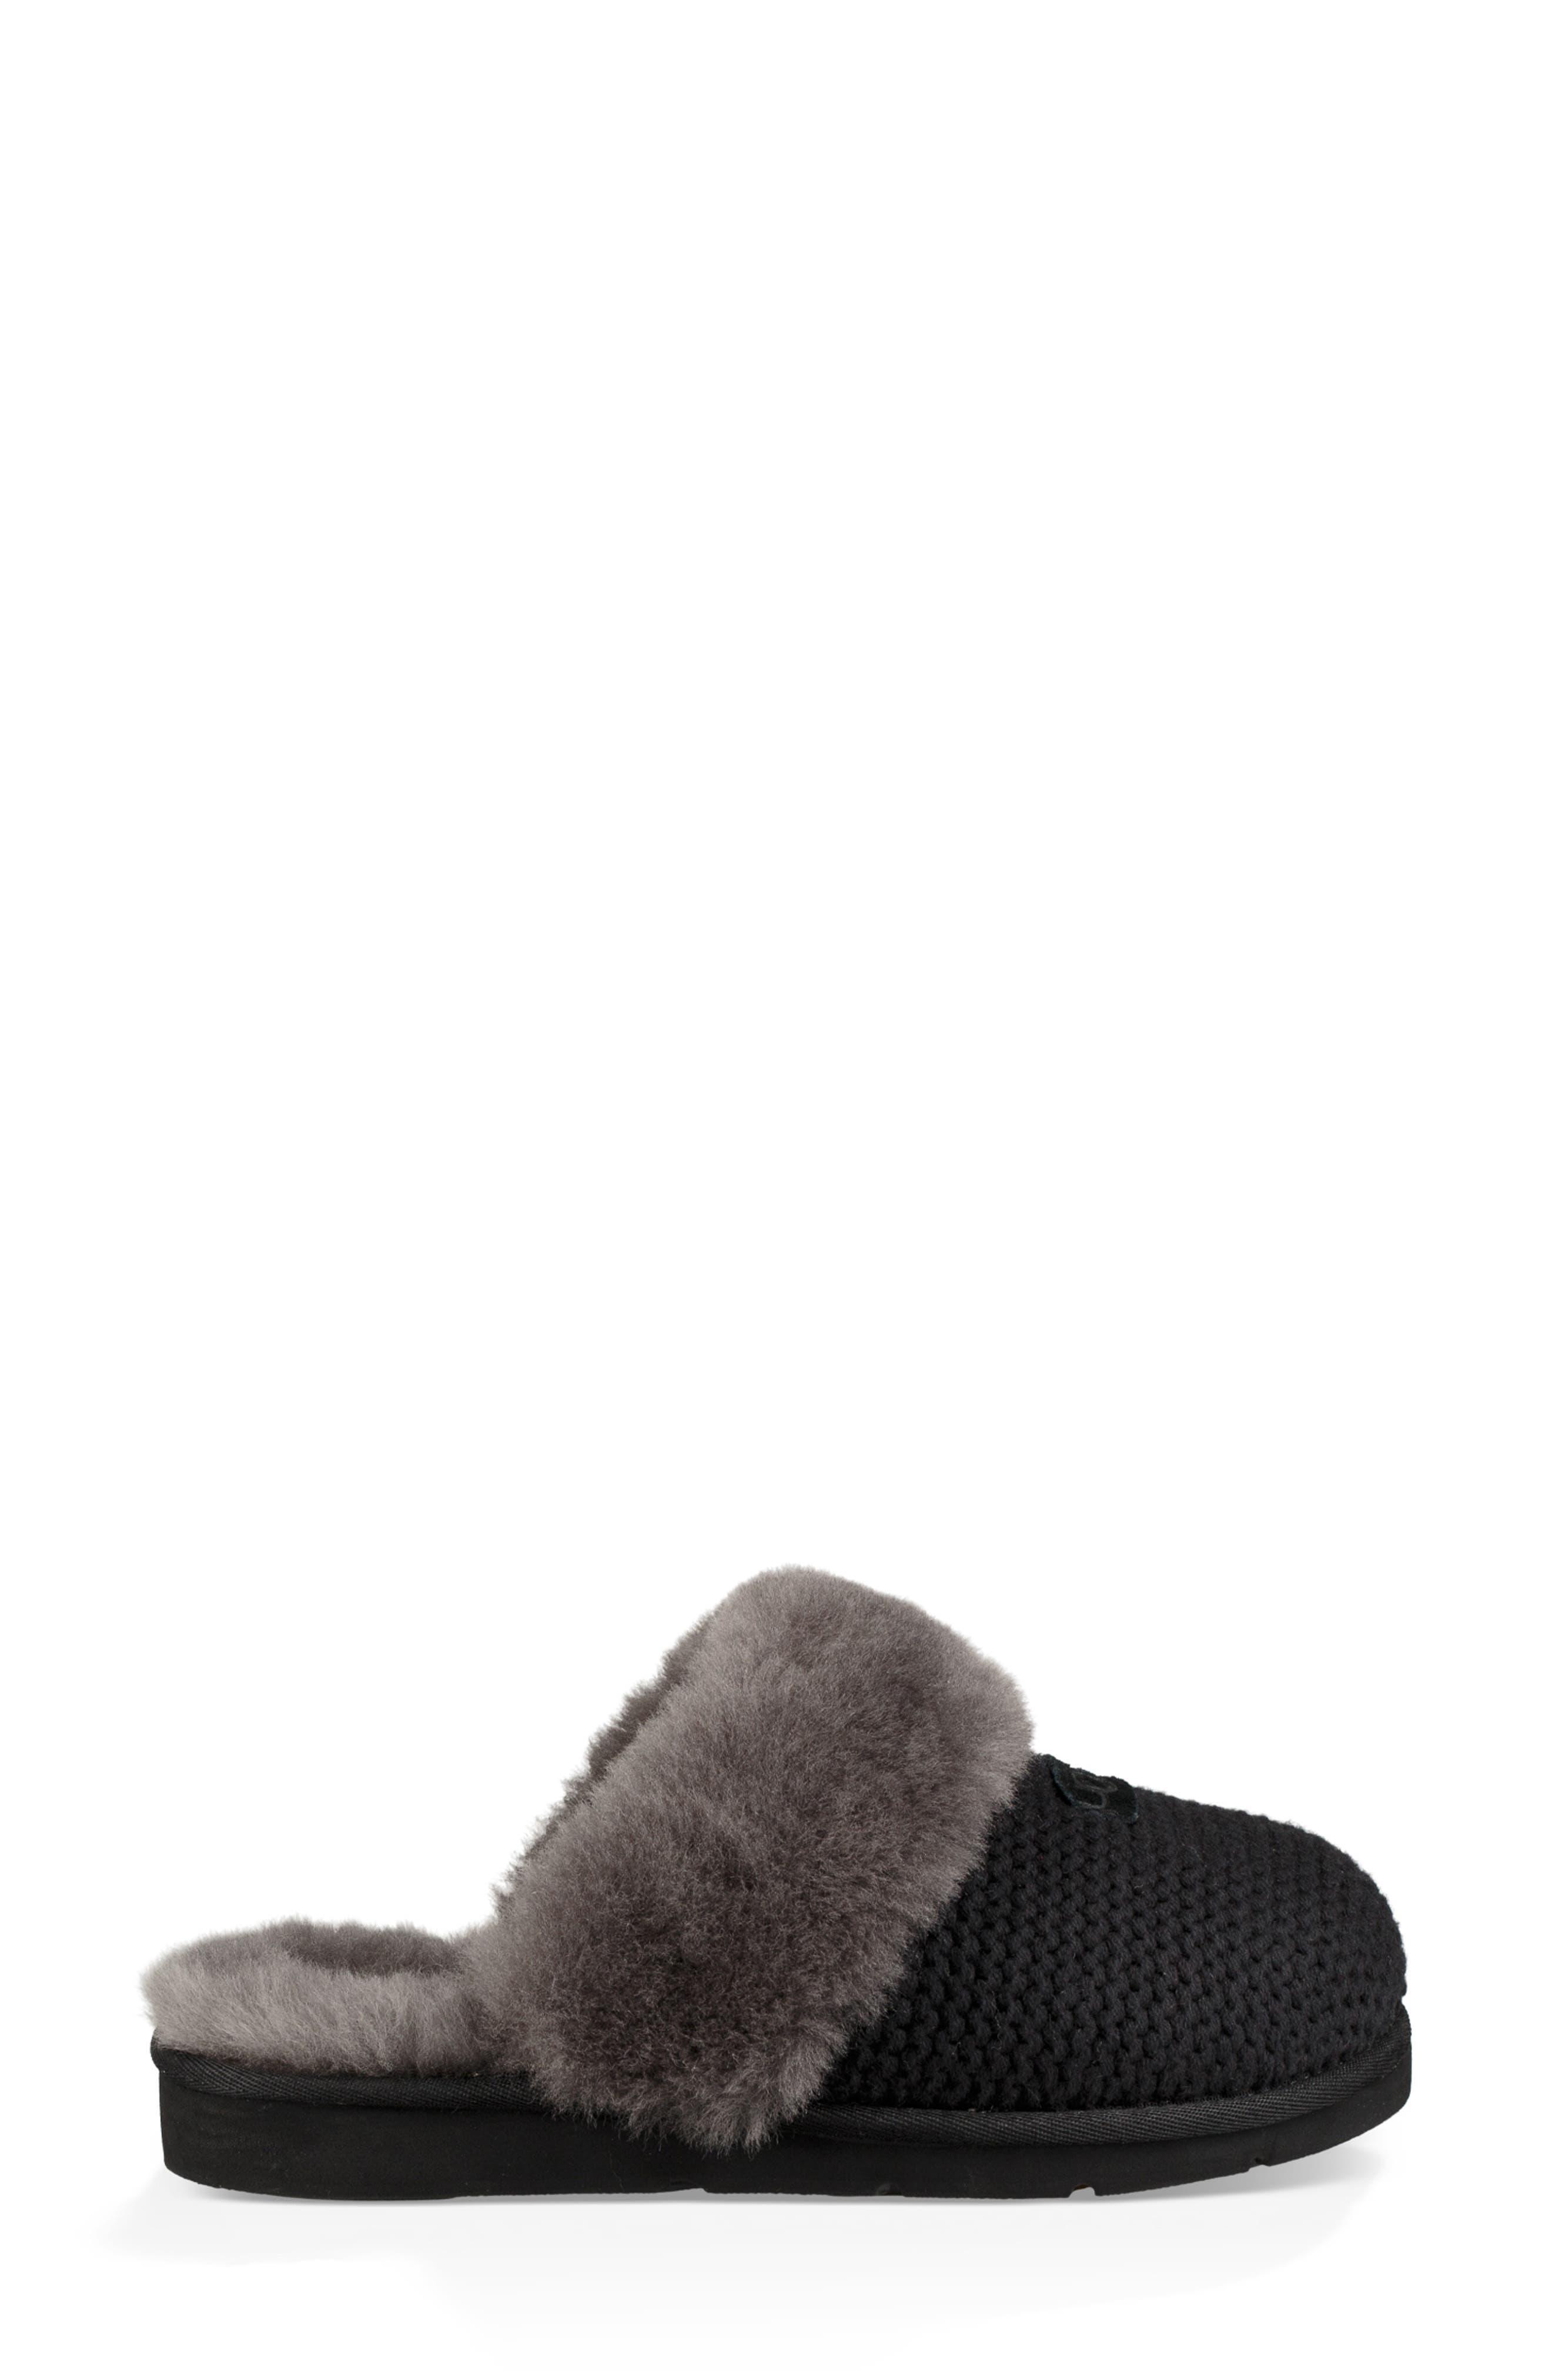 Cozy Knit Genuine Shearling Slipper,                             Alternate thumbnail 3, color,                             BLACK